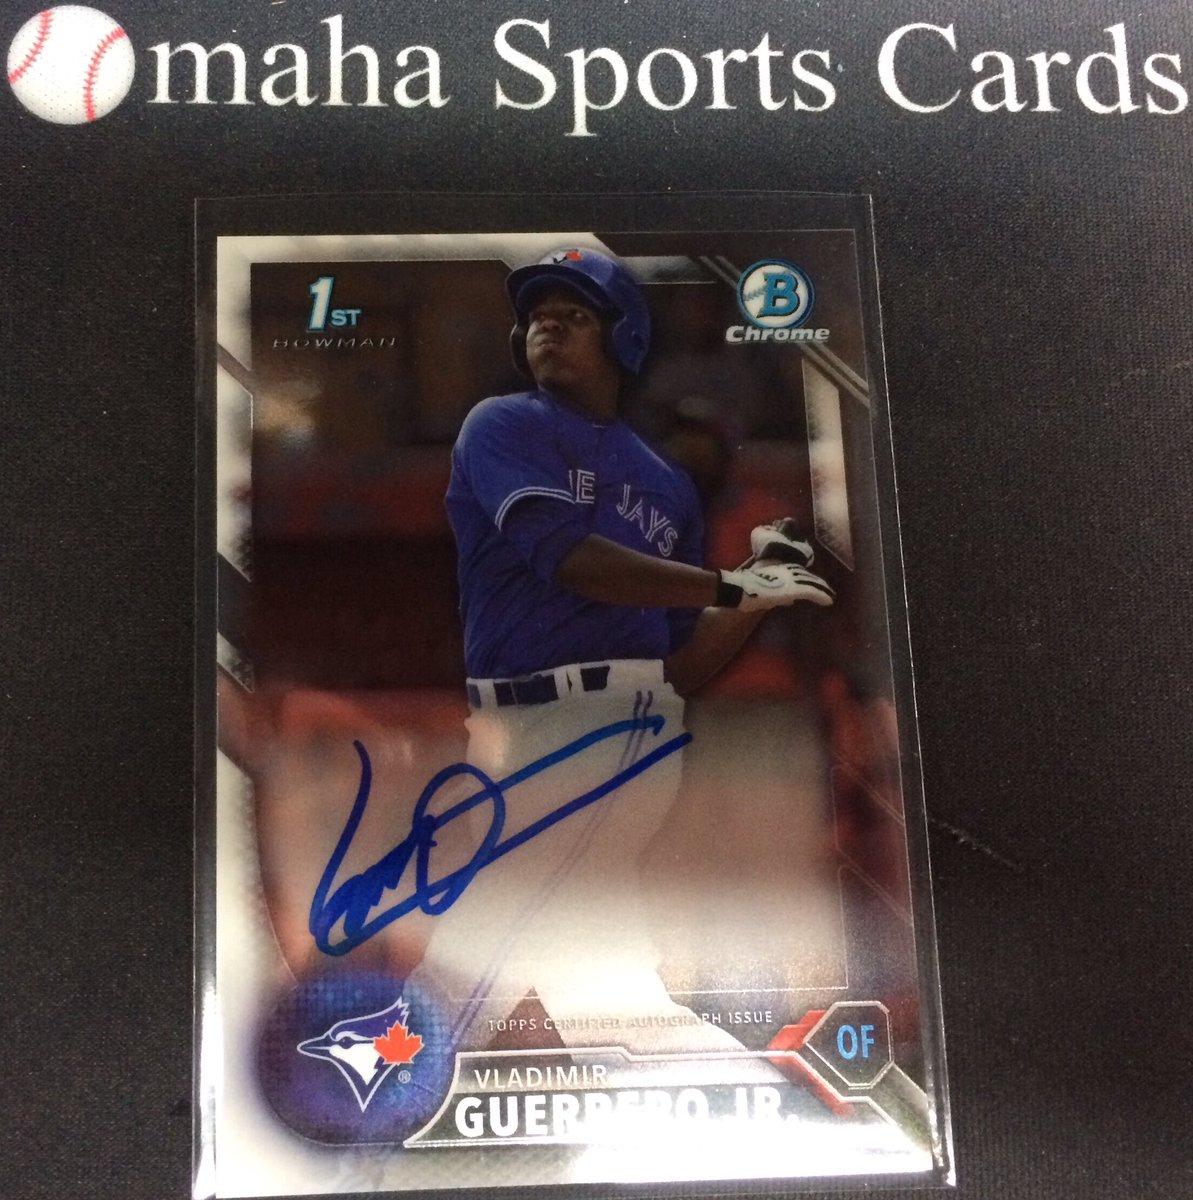 Omaha Sports Cards On Twitter Vladimir Guerrero Jr On